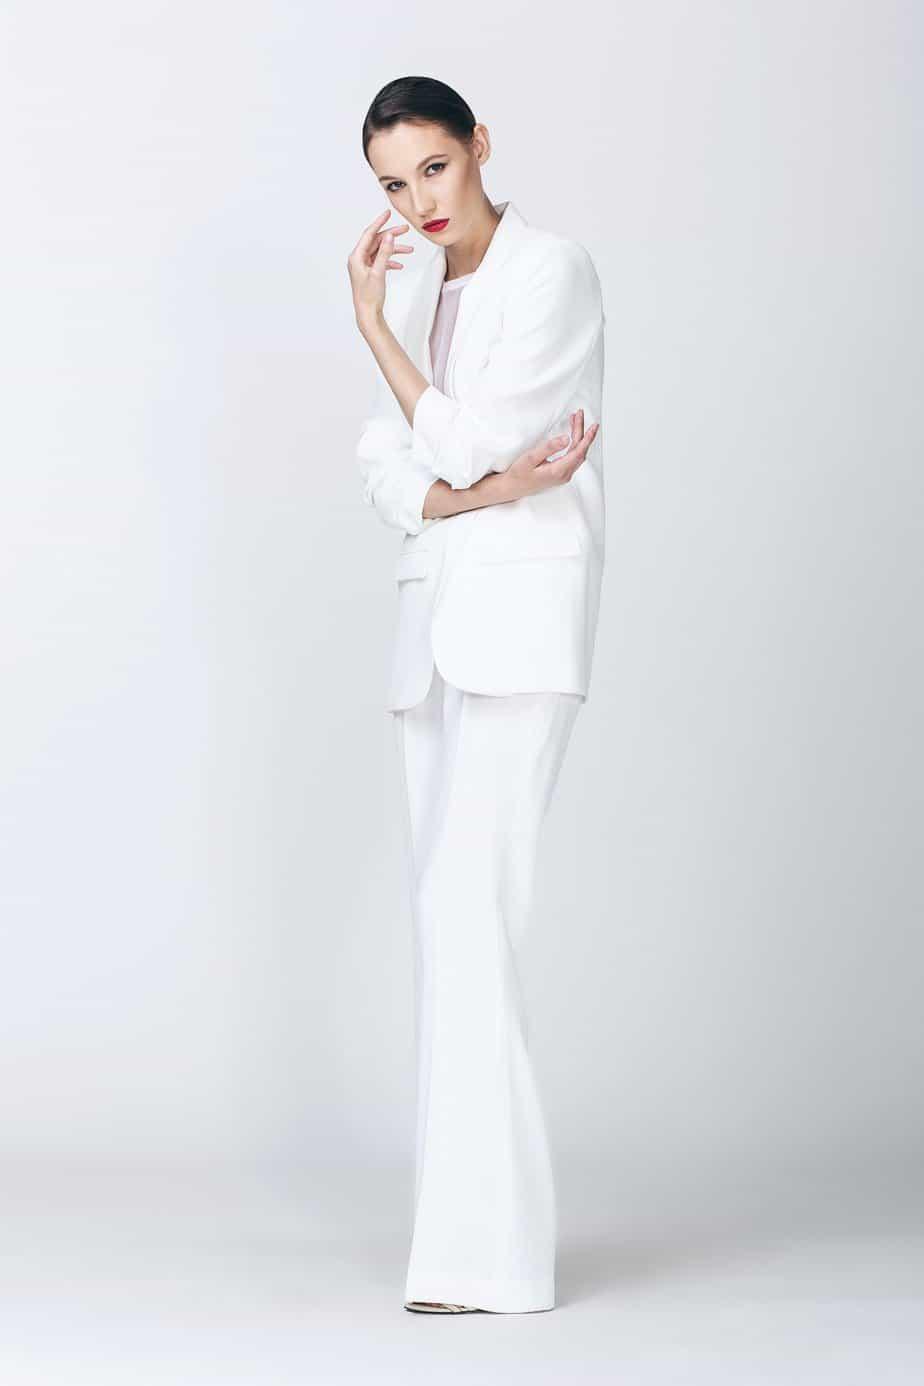 White_fashionshot_fashionphotography_francescabandiera